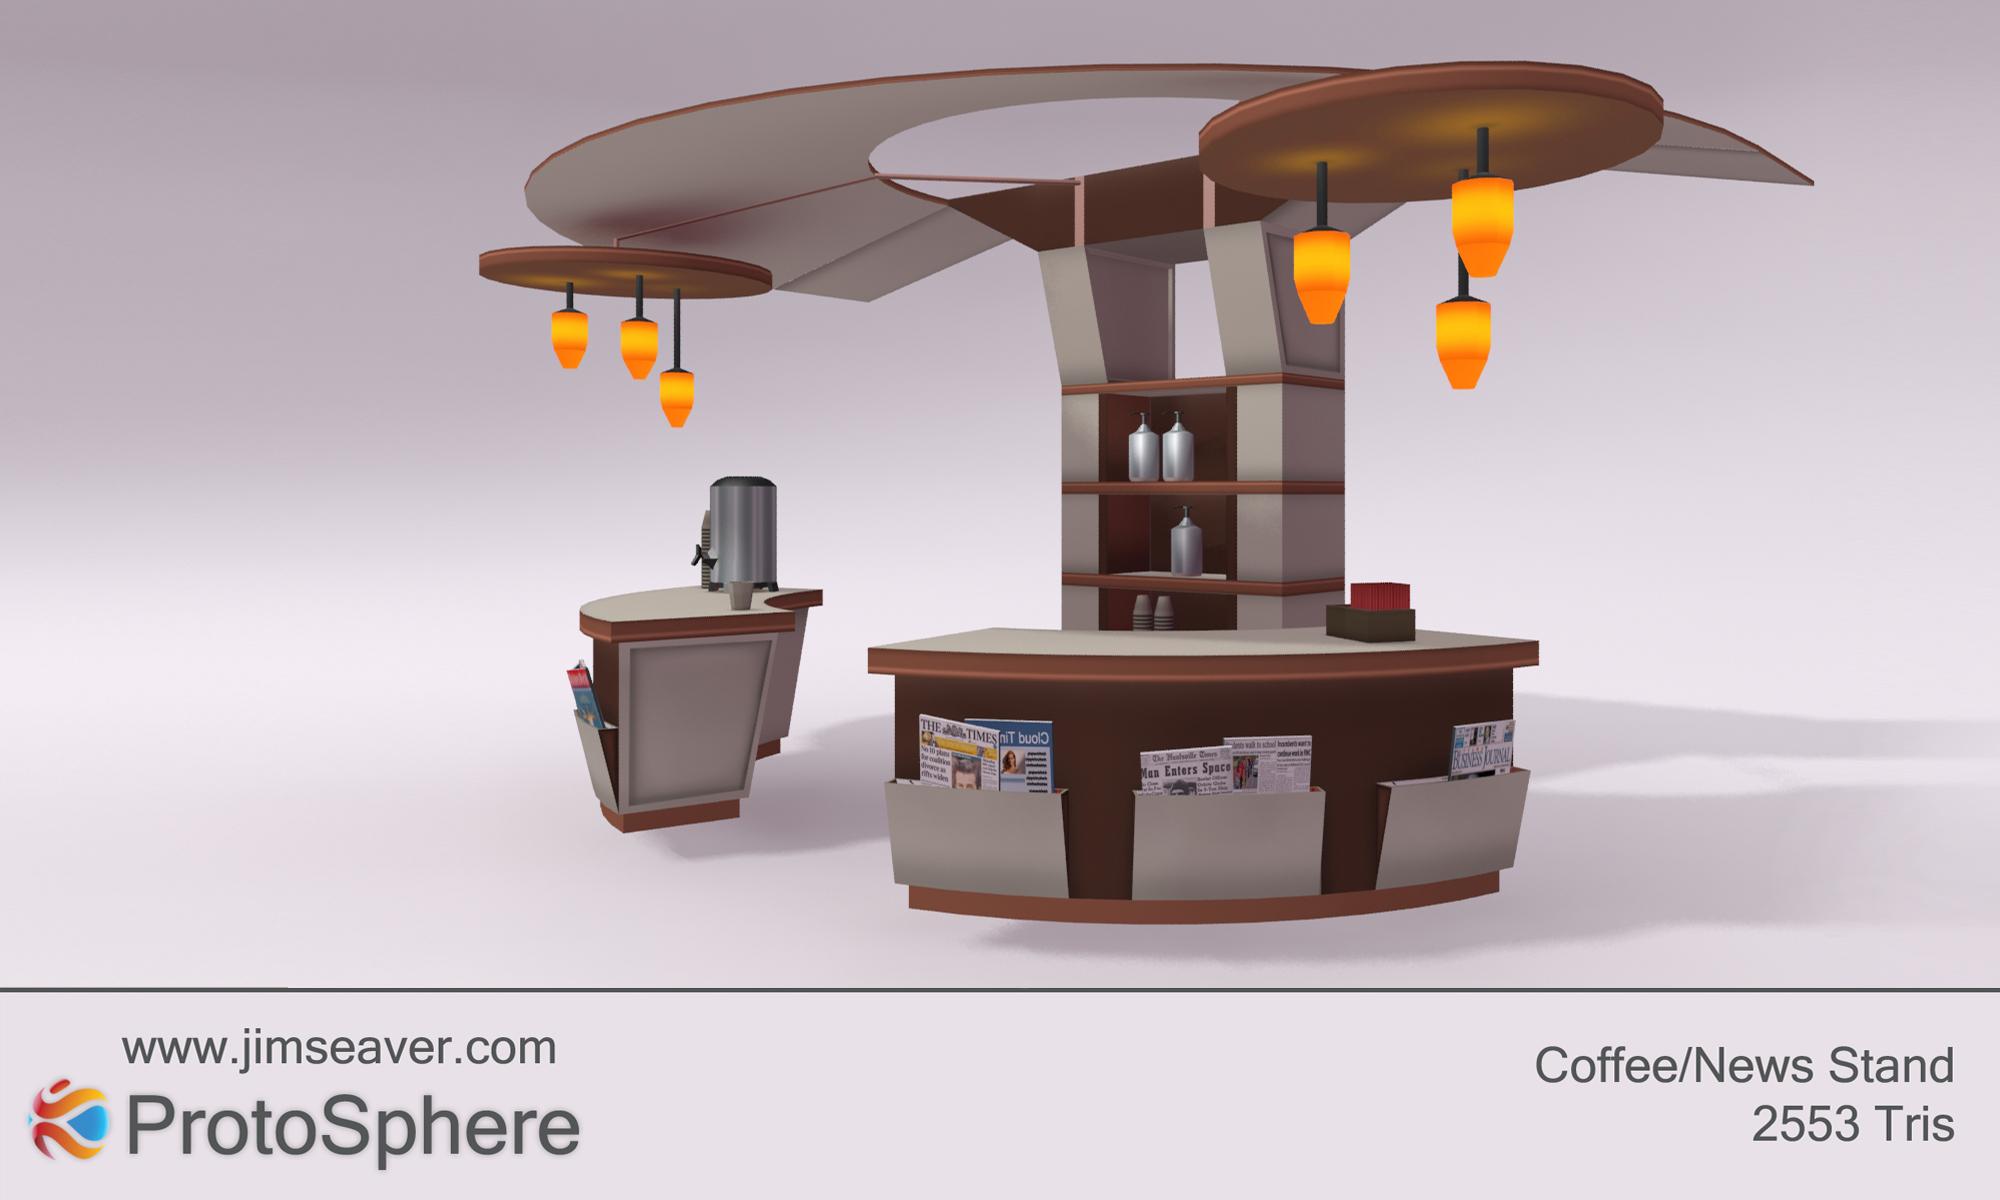 CoffeeStand.jpg